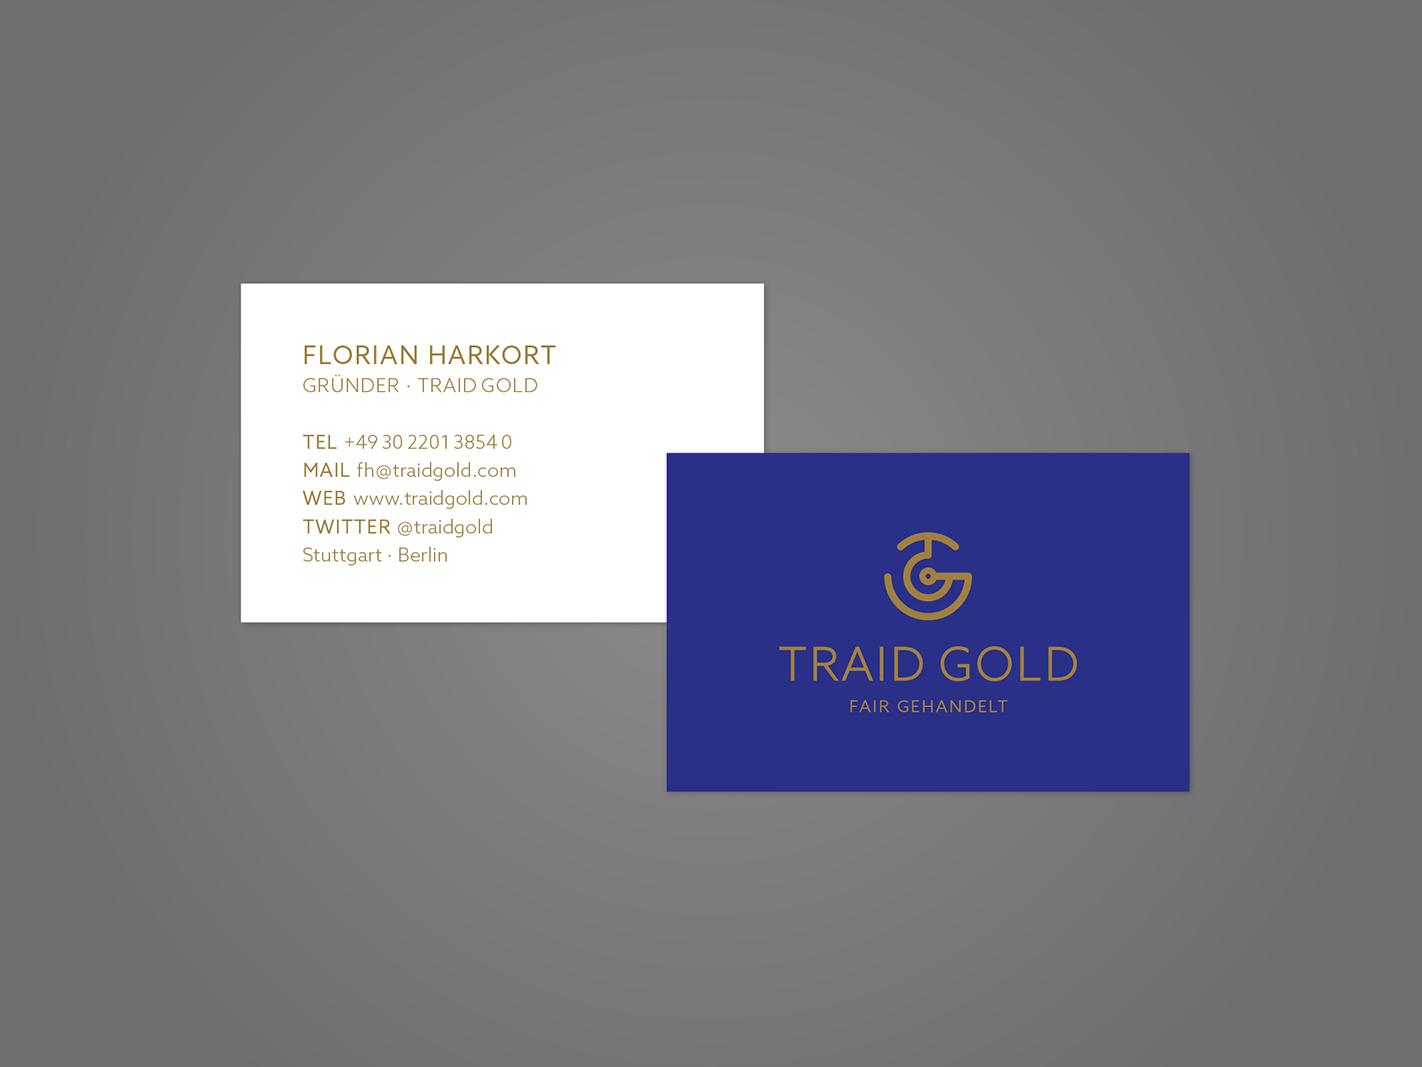 ATK-TRAID-GOLD-Corporat-Design-6.jpg